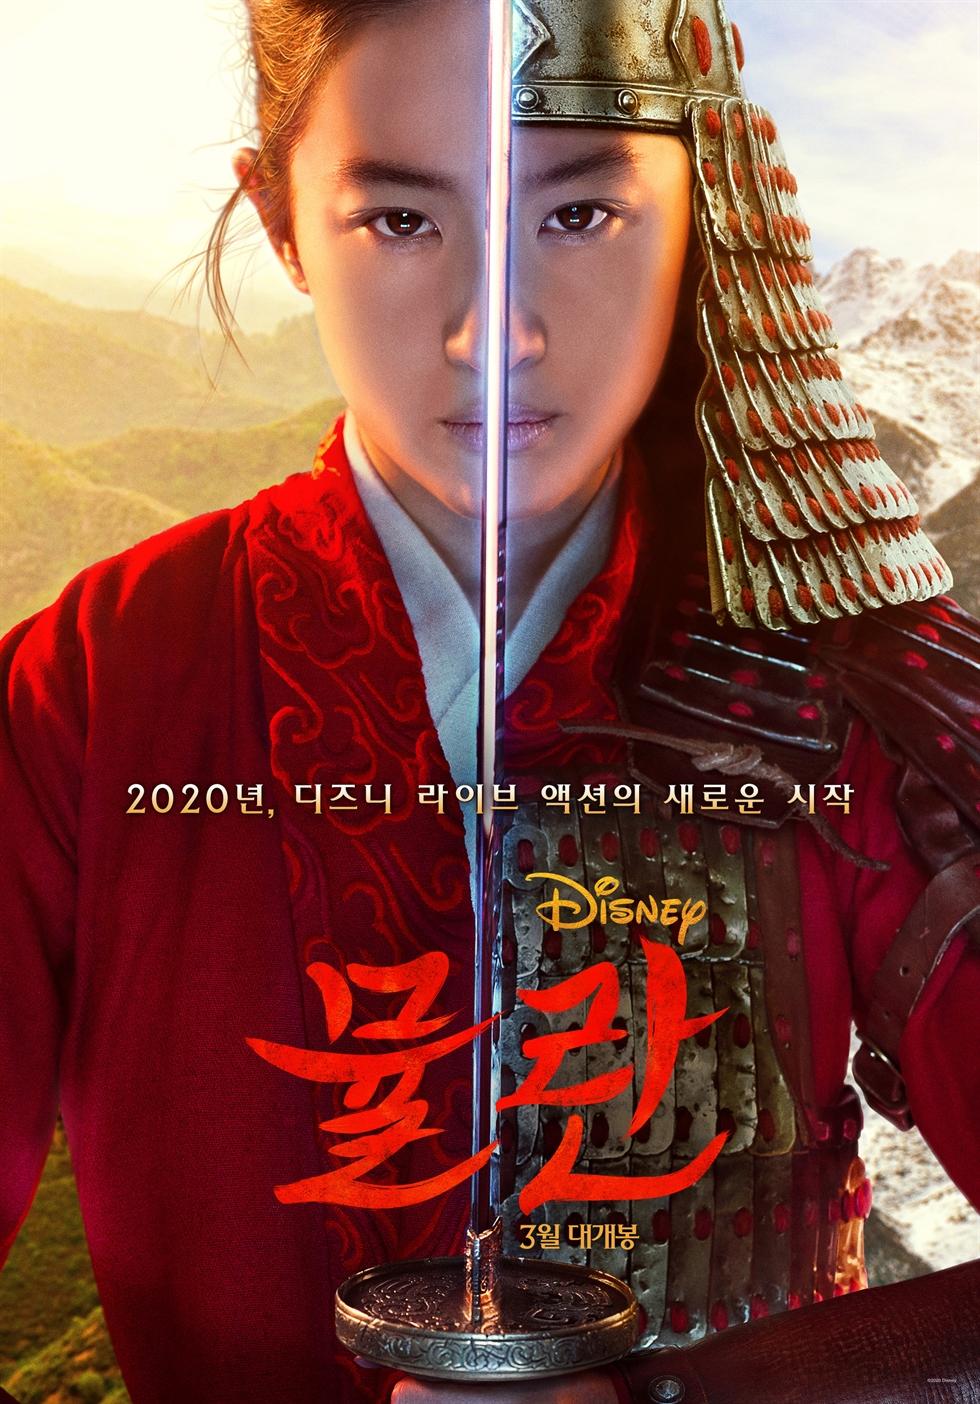 Disney Reveals Korea Exclusive Mulan Poster